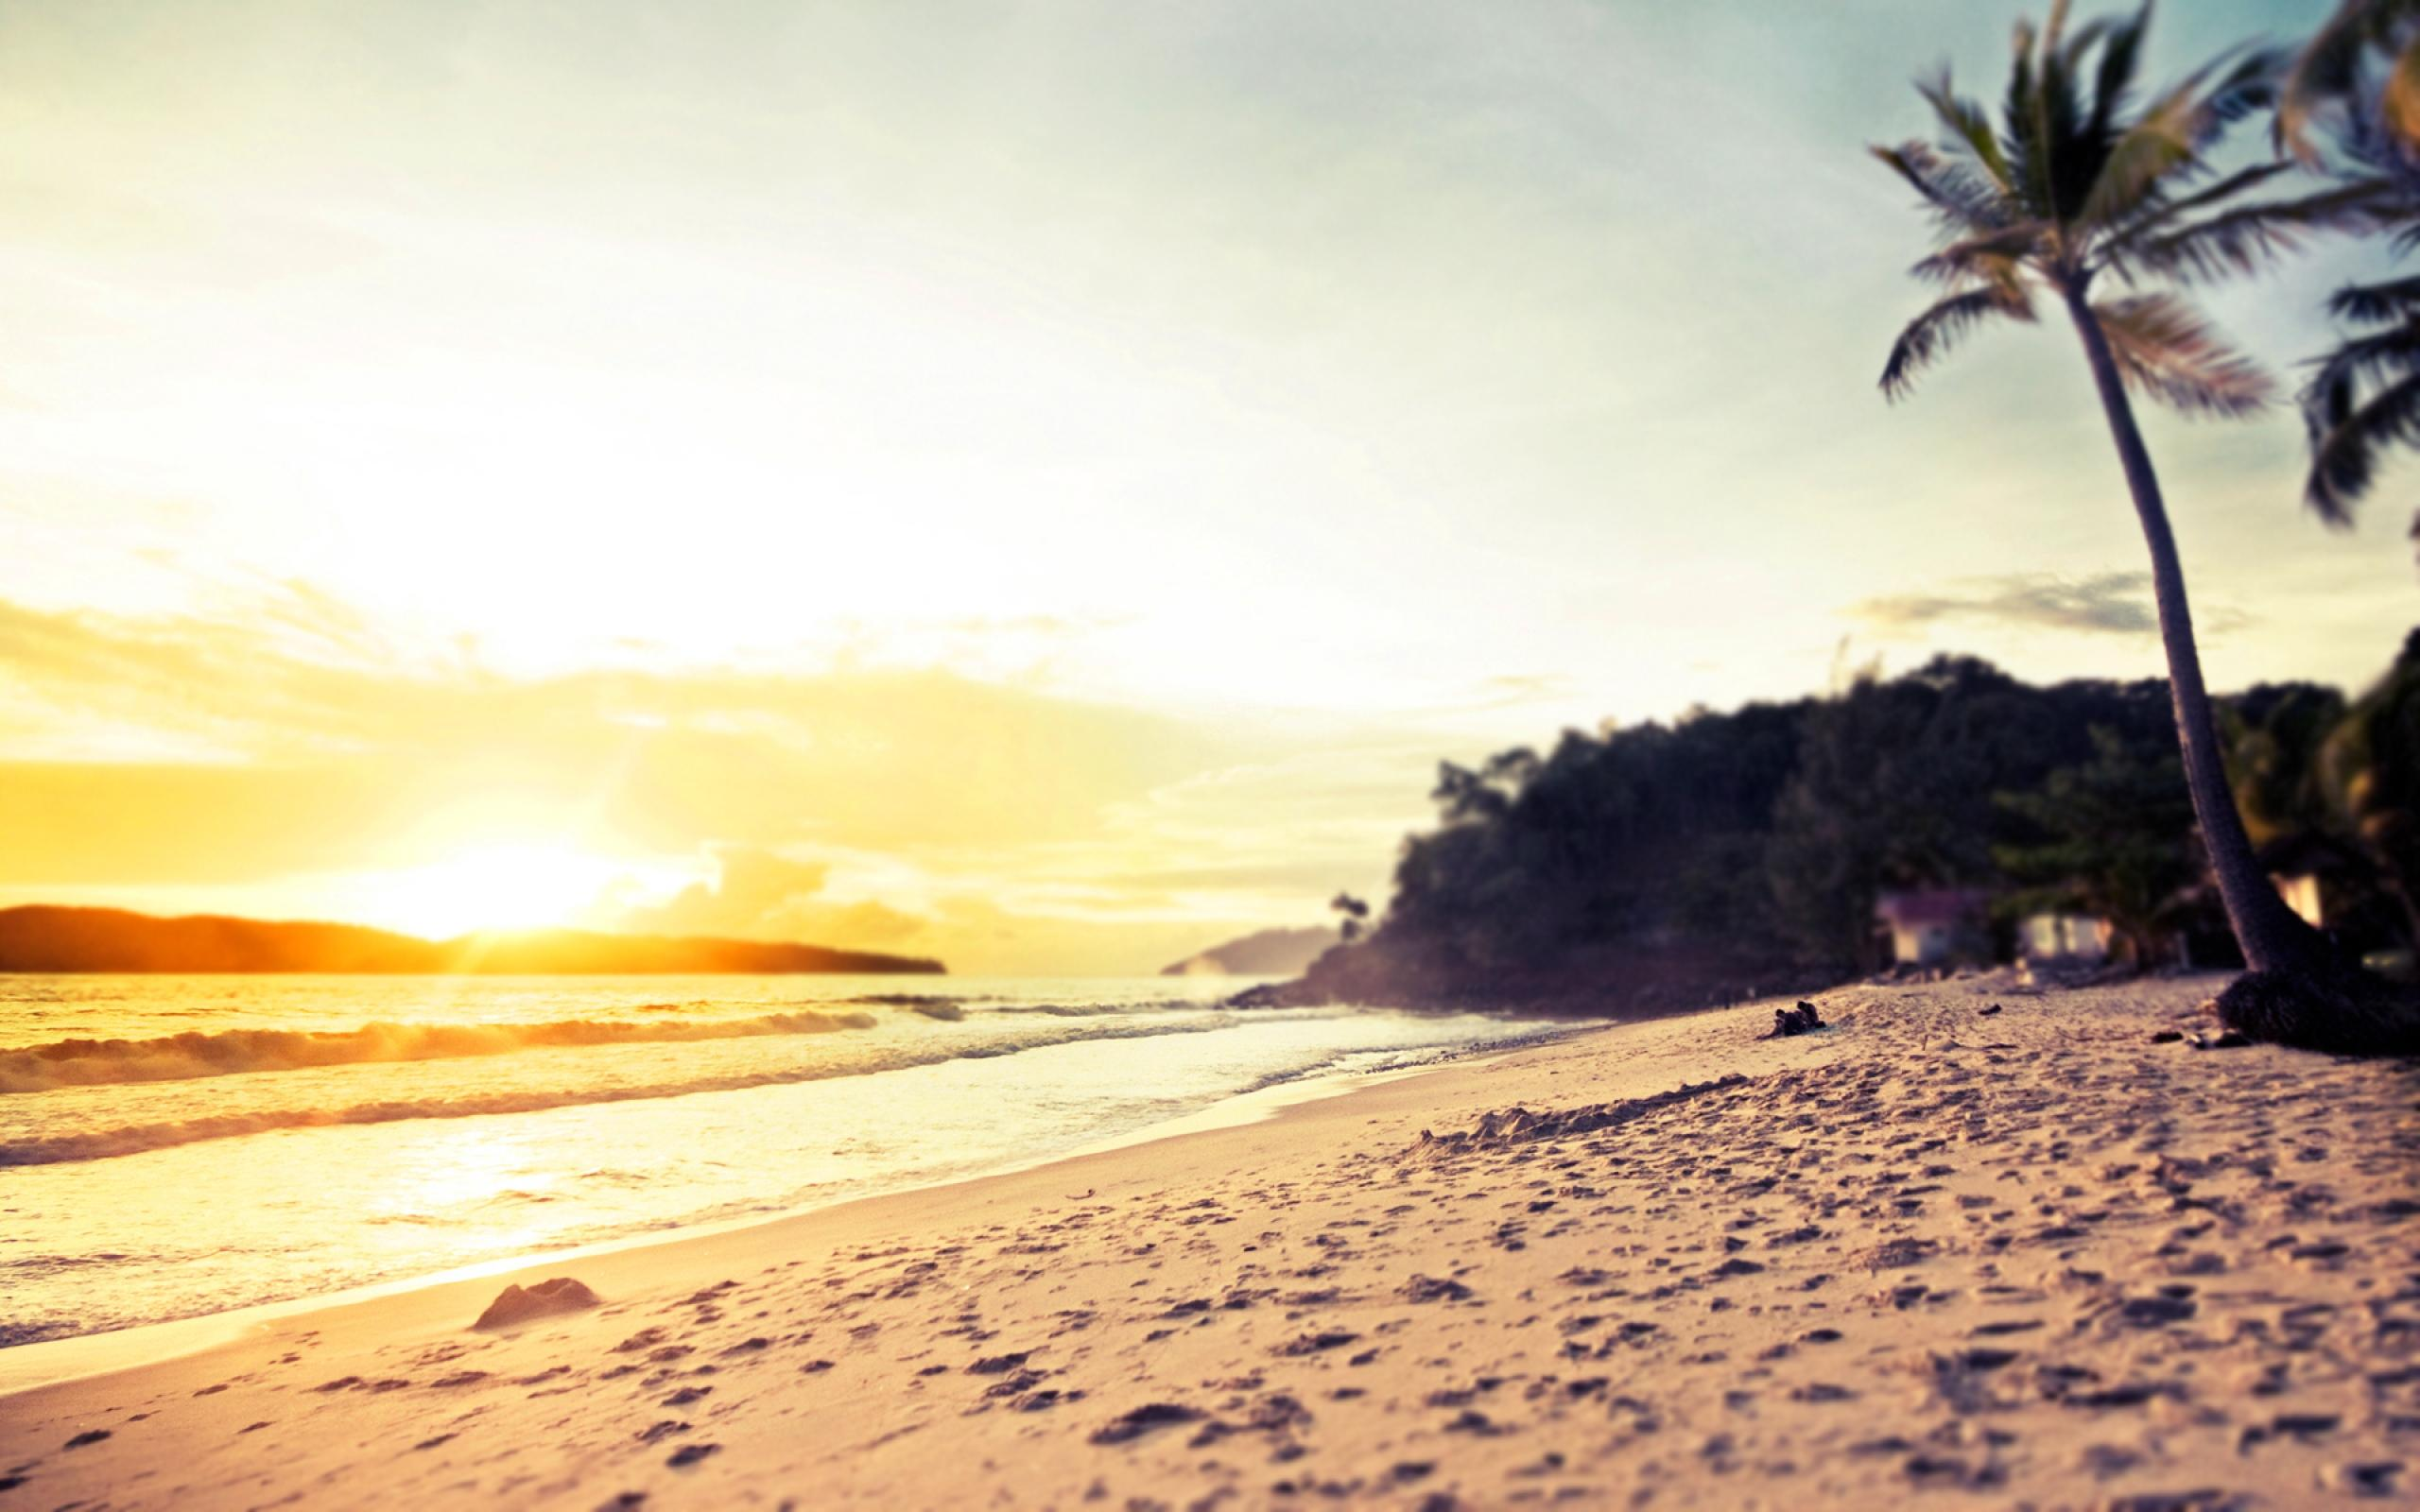 California Beaches Tumblr Wallpaper Photography Beach Background Hd 2560x1600 Download Hd Wallpaper Wallpapertip